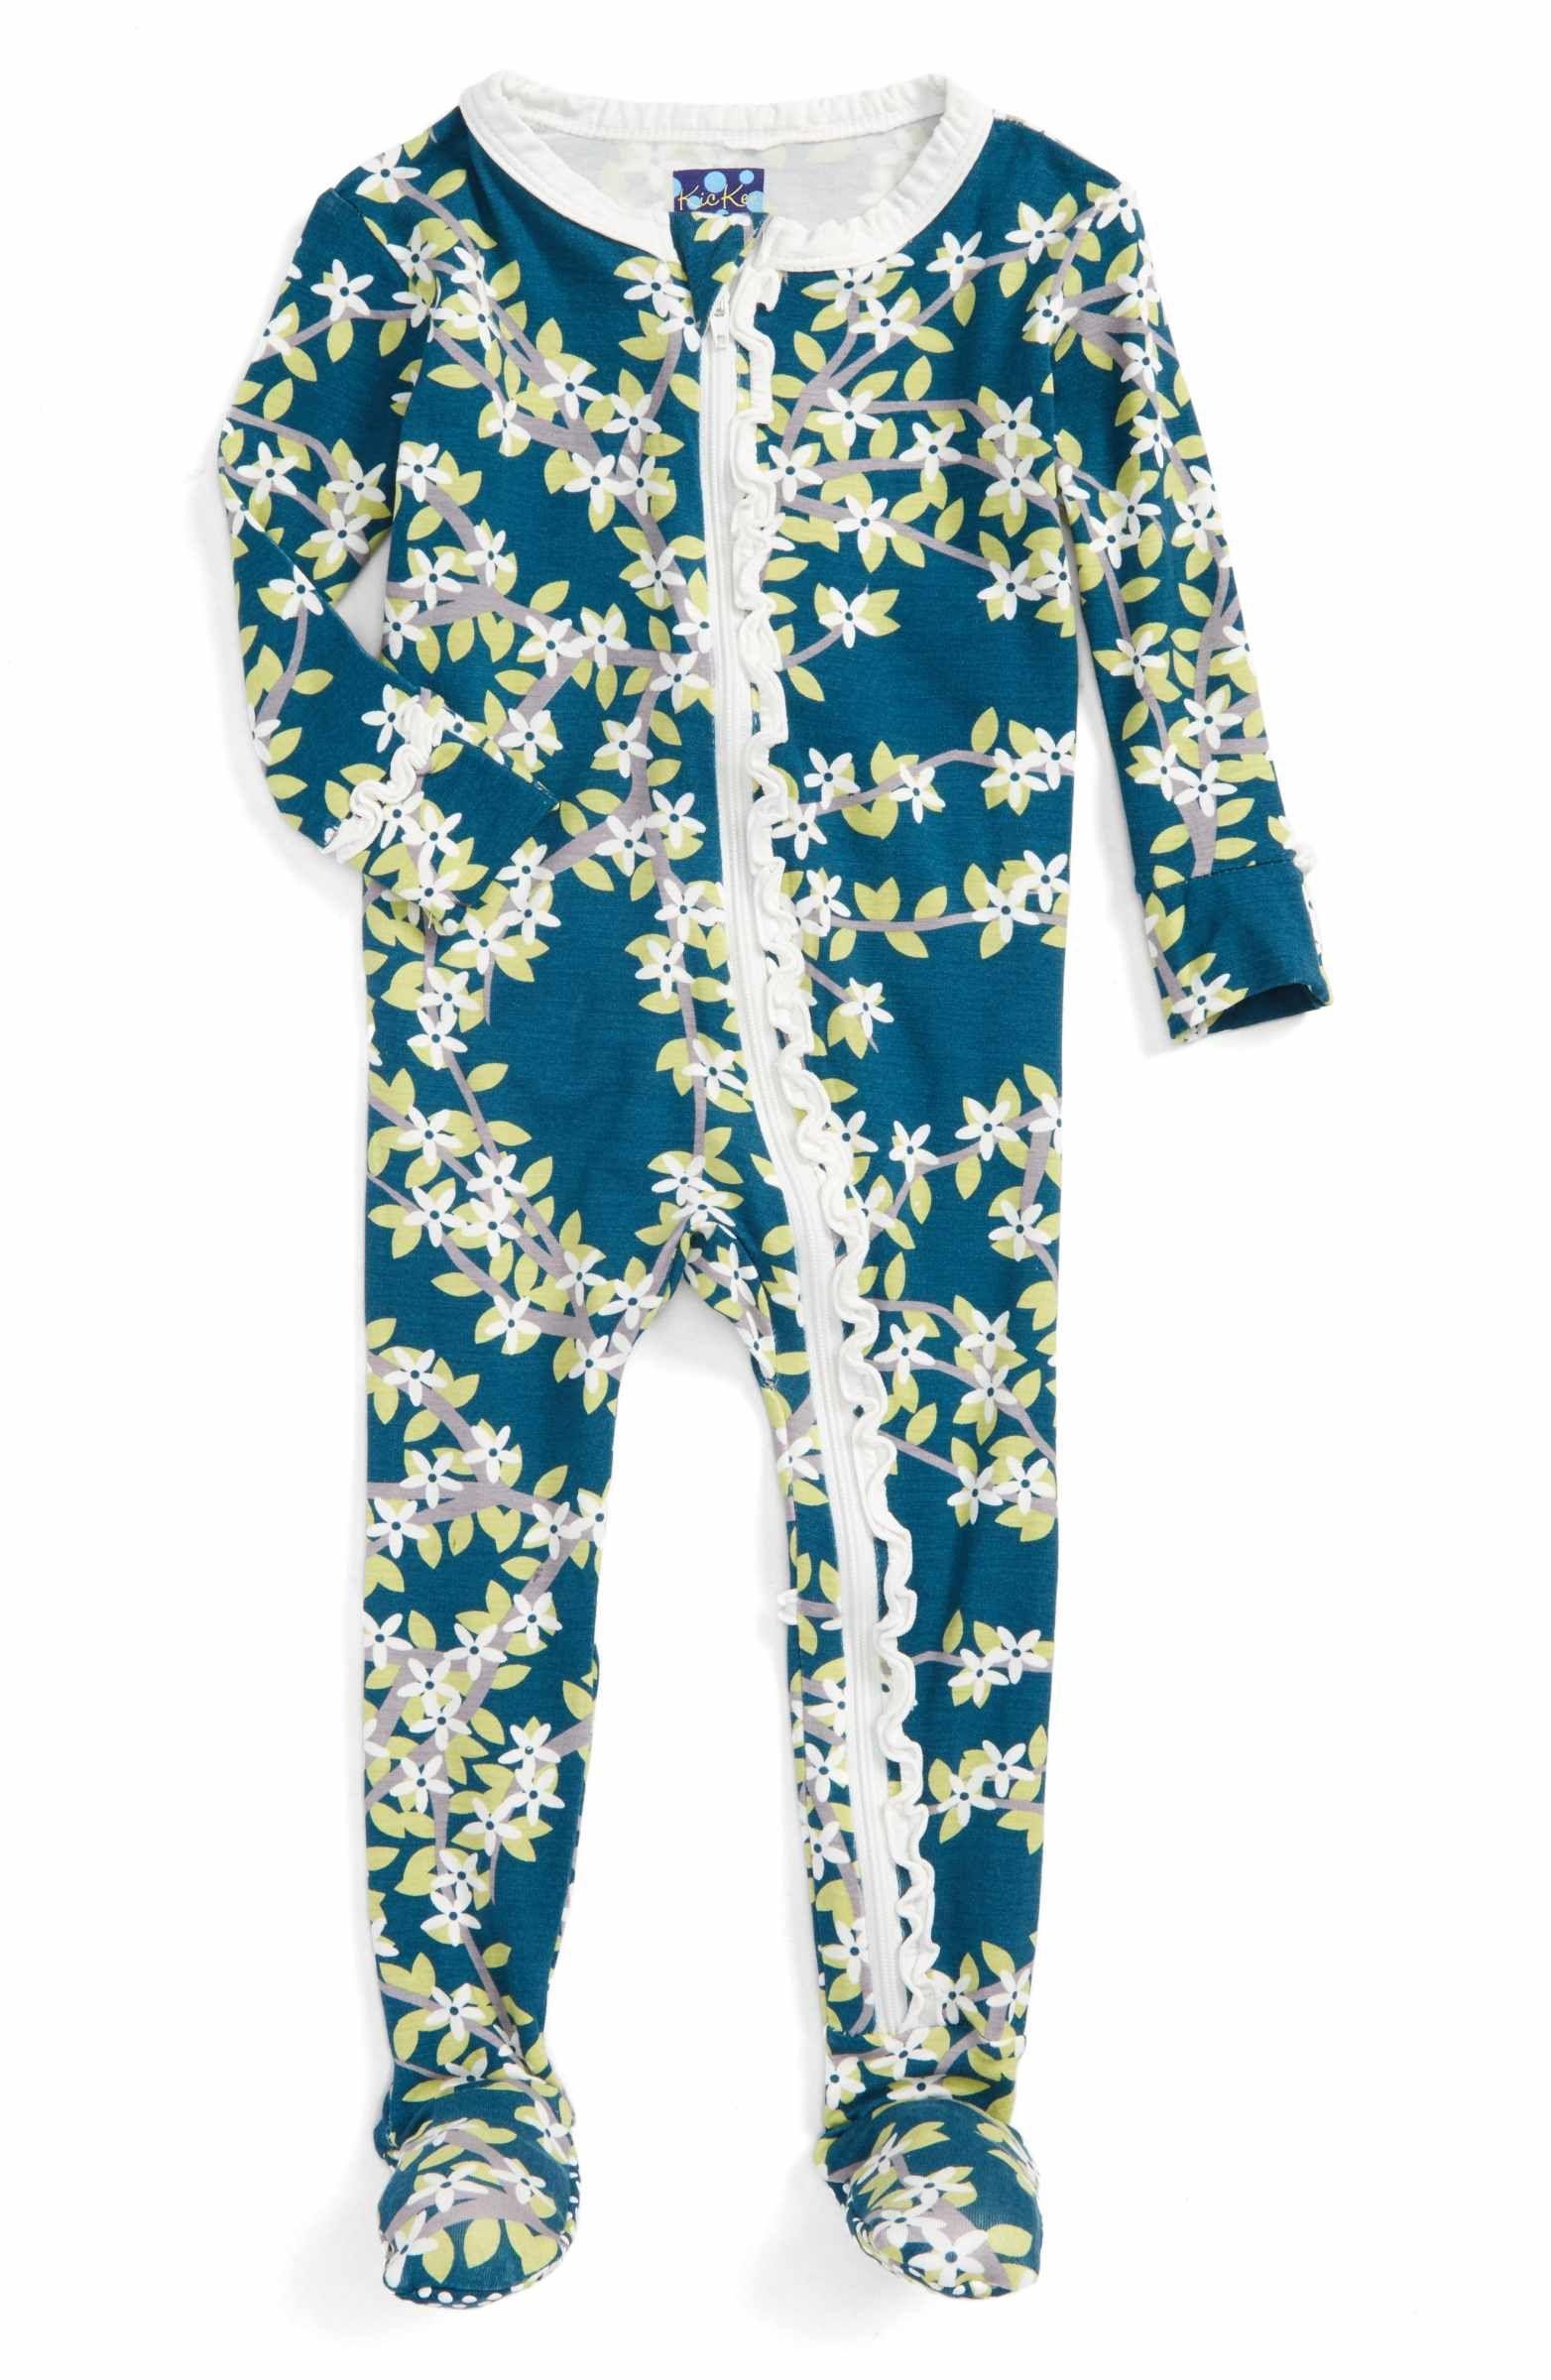 Main Image Kickee Pants Fitted e Piece Footie Pajamas Baby